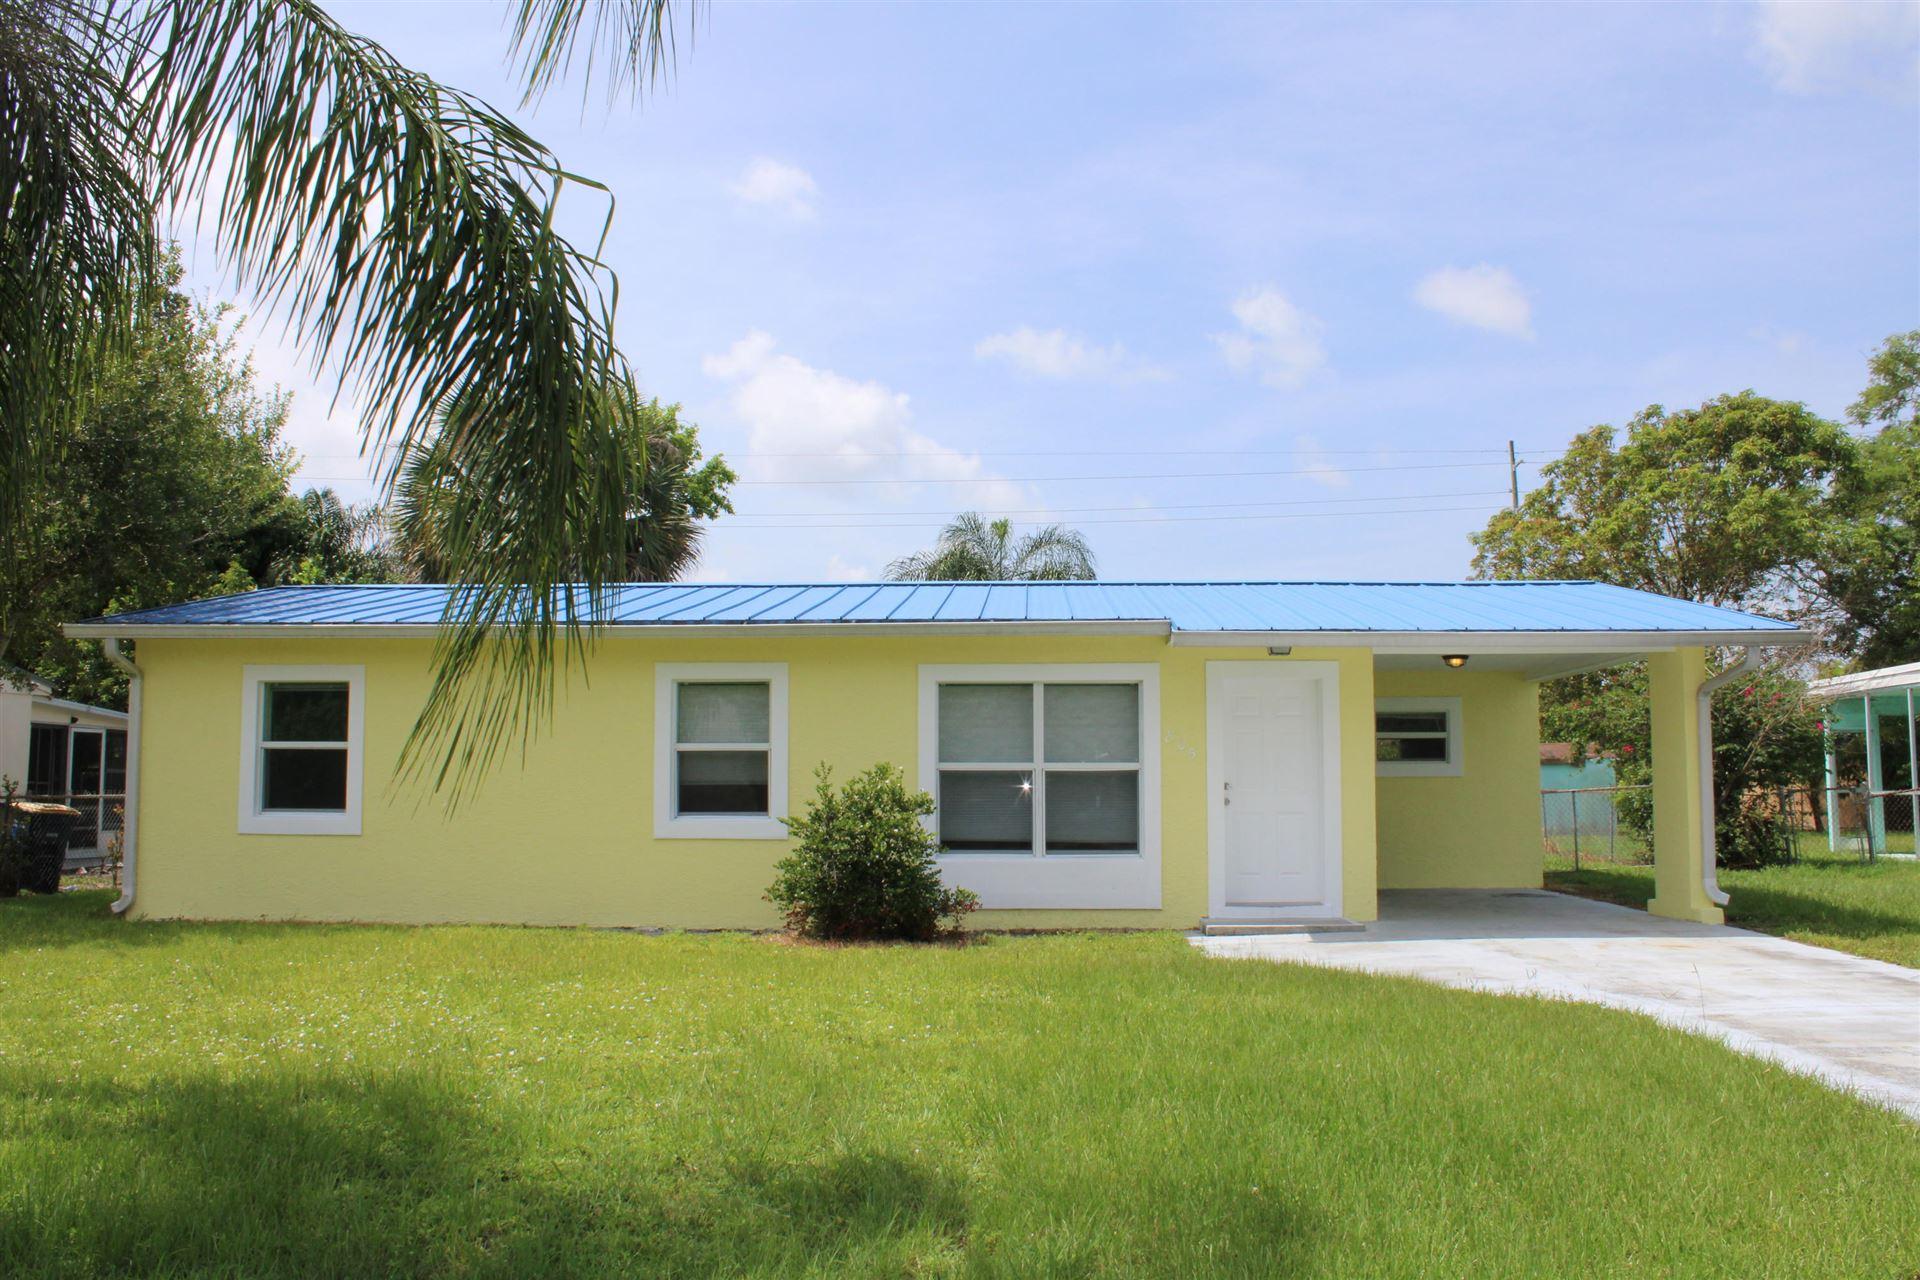 805 Wisteria Avenue, Fort Pierce, FL 34982 - #: RX-10637881